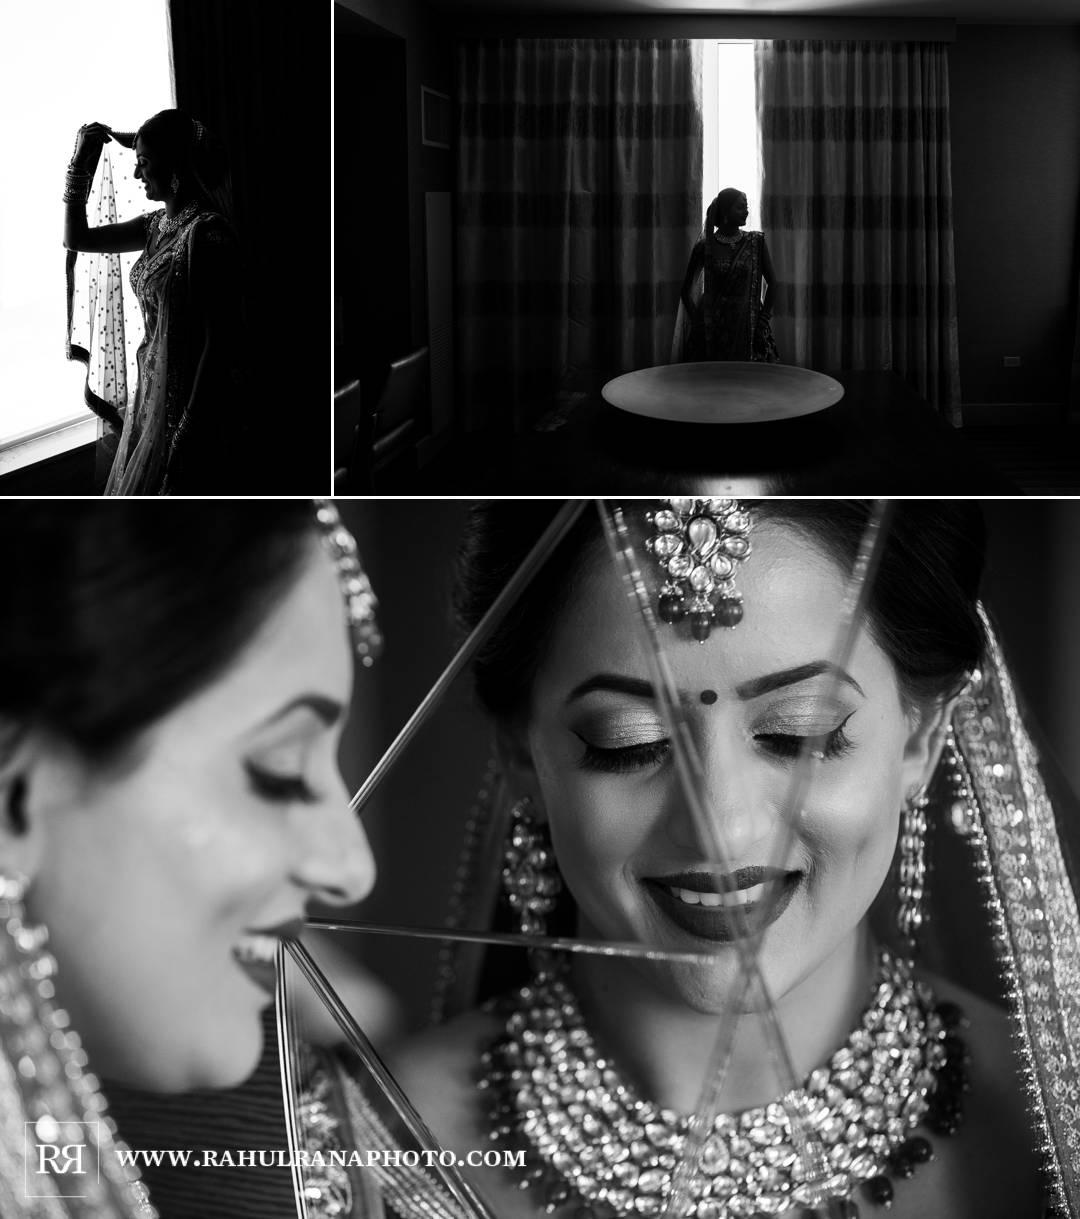 Westin North Shore - Illinois Indian Wedding - Bride Portraits Mirror - Rahul Rana Photo